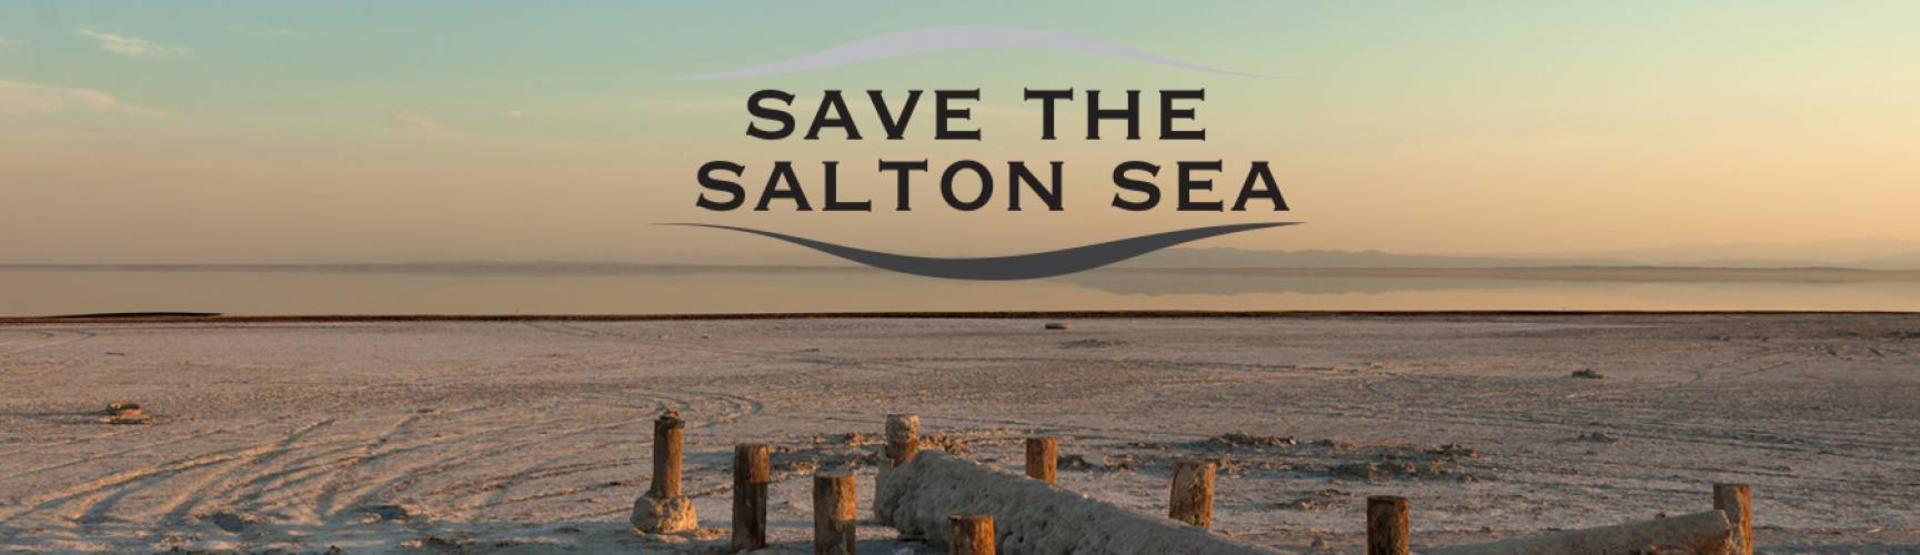 Save the Salton Sea